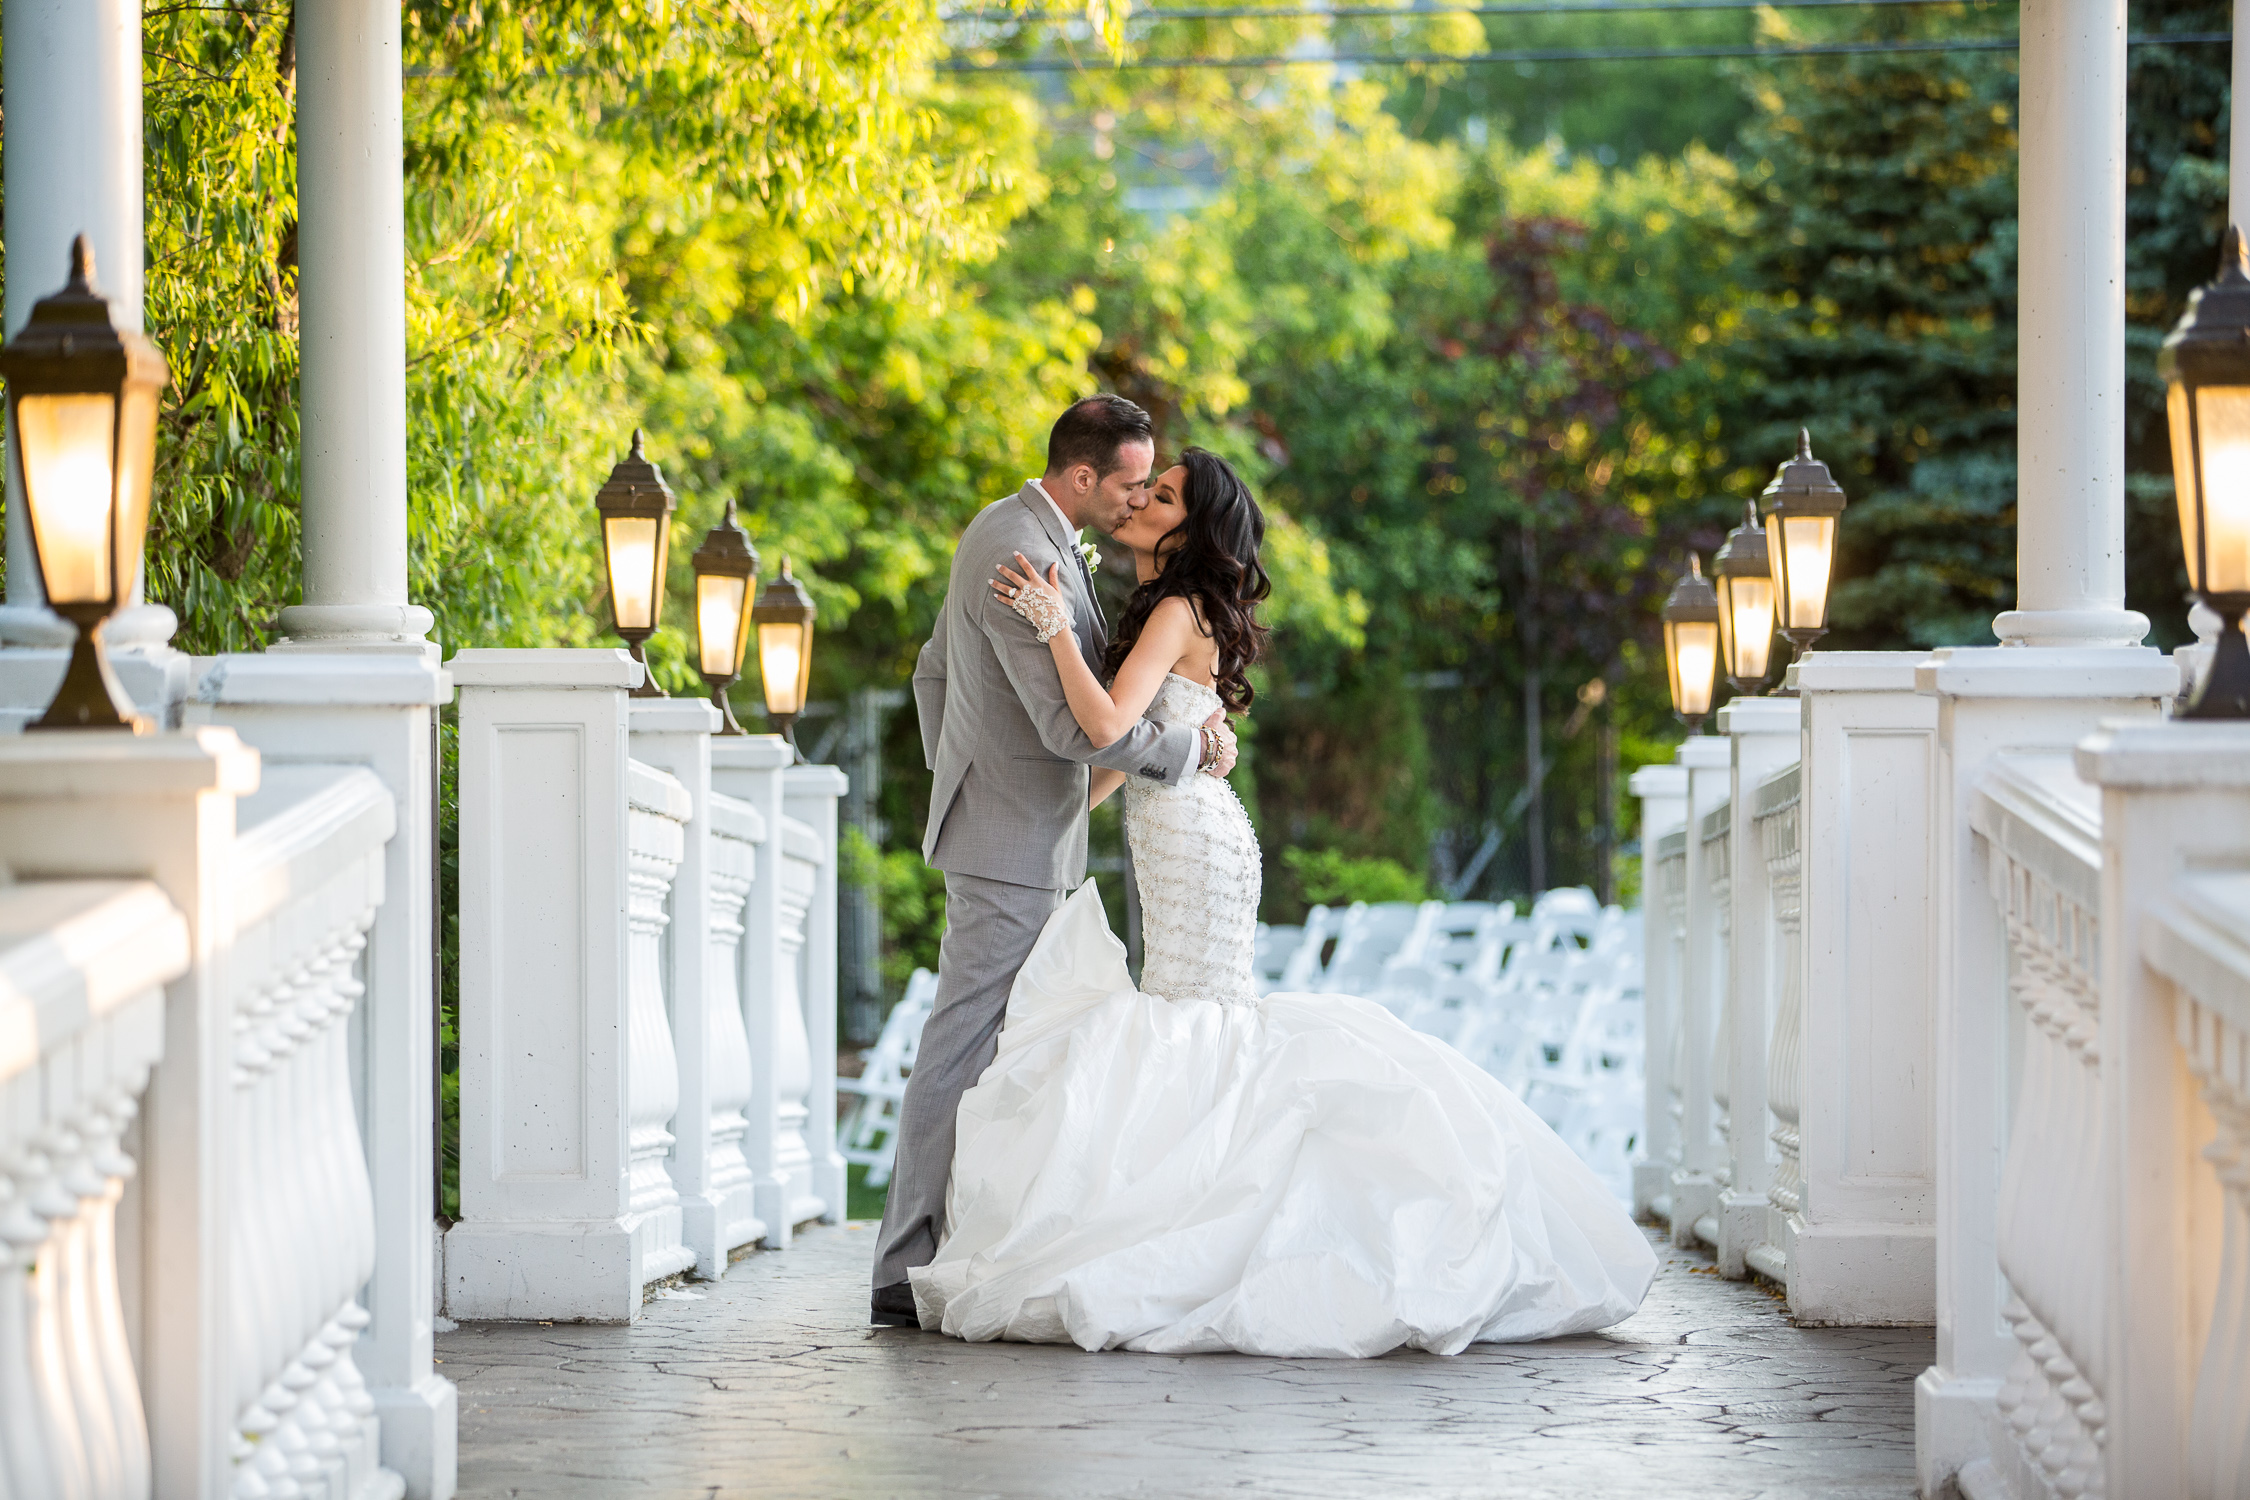 Paradise-Banquet-Hall-Wedding-Vaughan-Ontario-0083.jpg